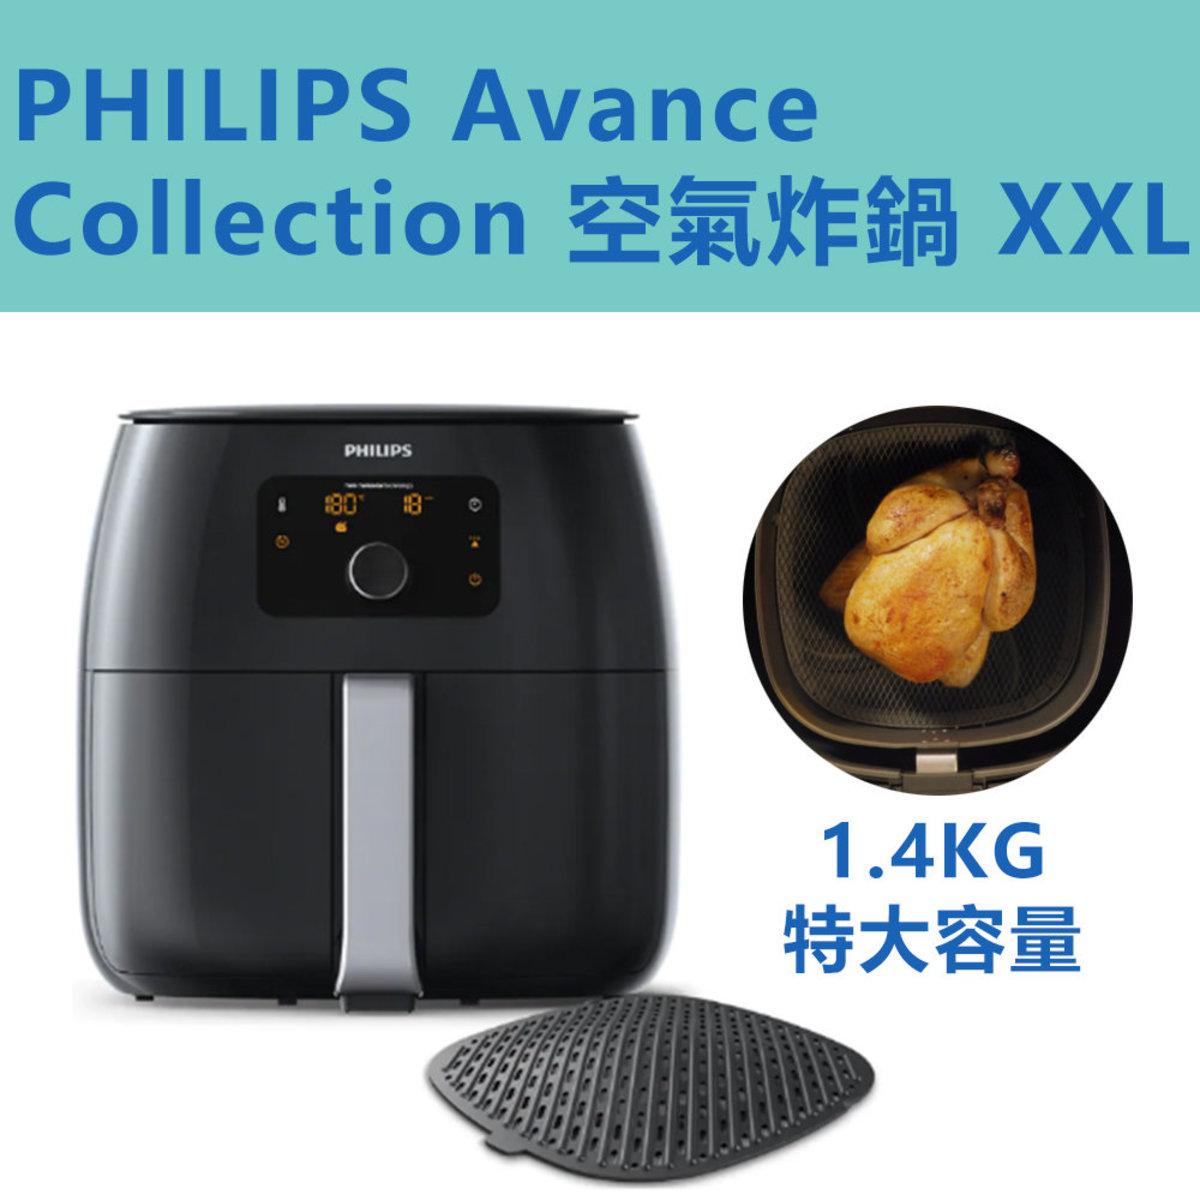 Avance Collection 空氣炸鍋 XXL HD9654